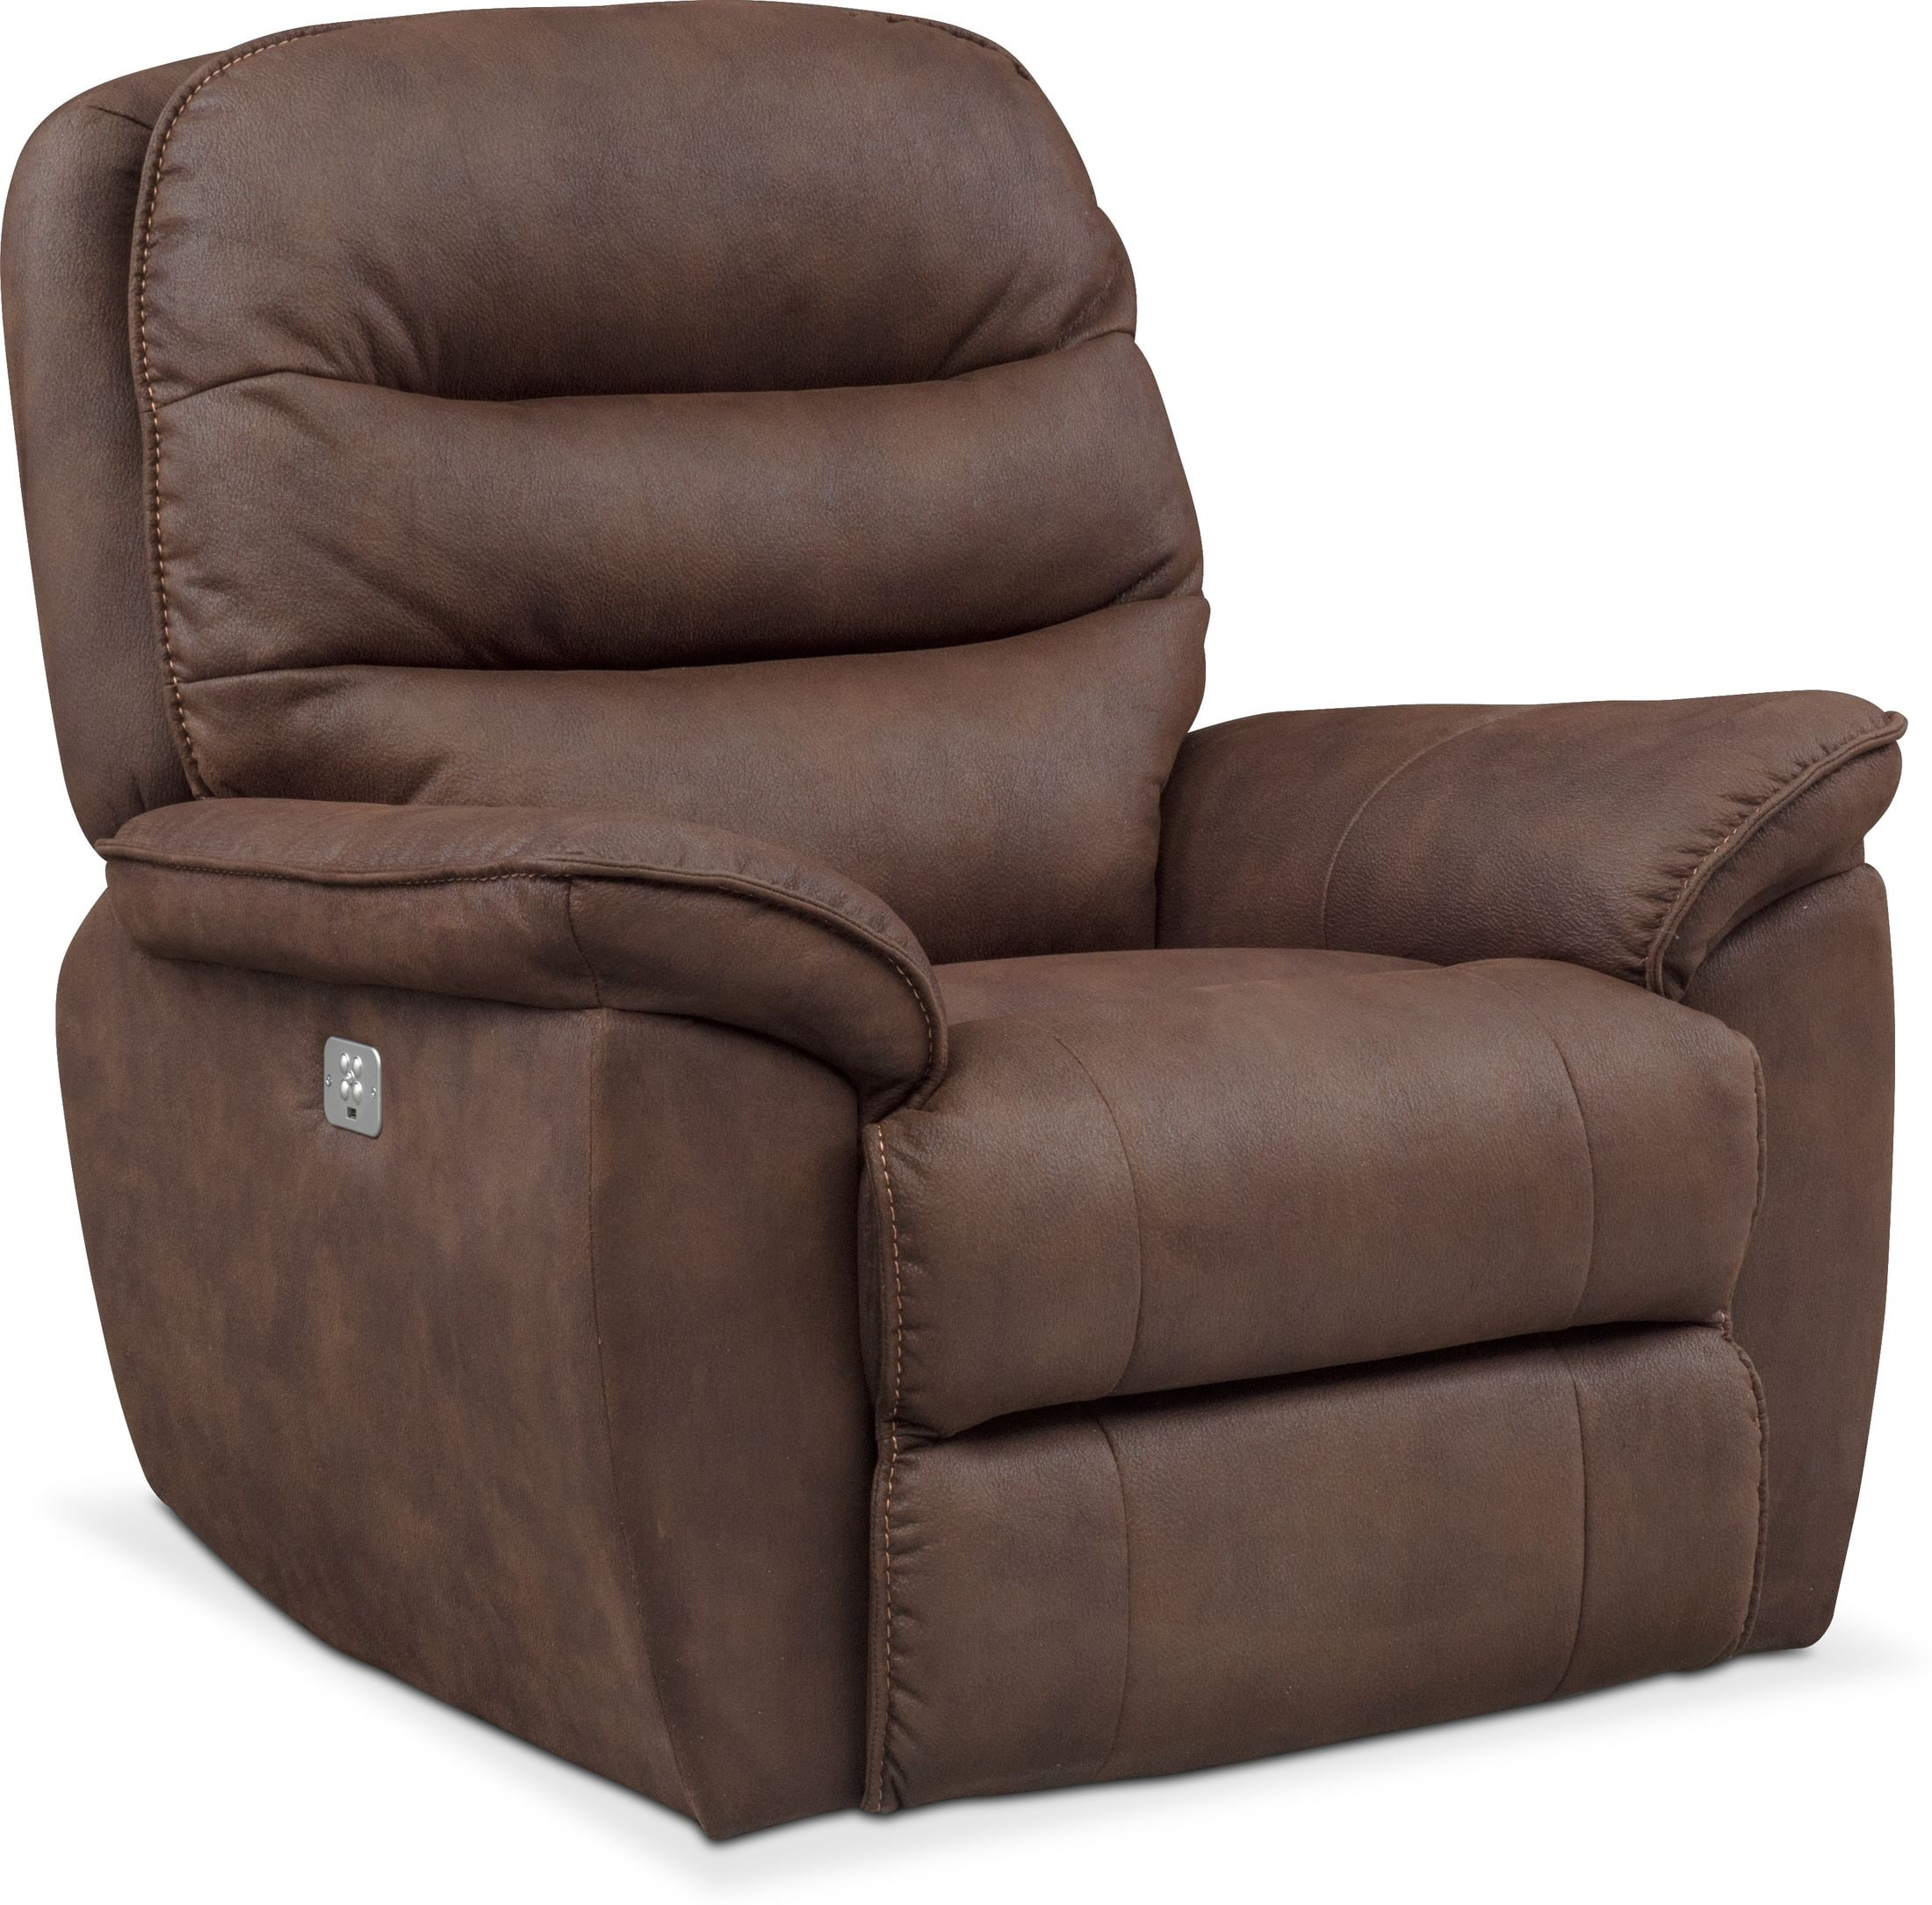 Living Room Furniture - Regis Dual-Power Recliner